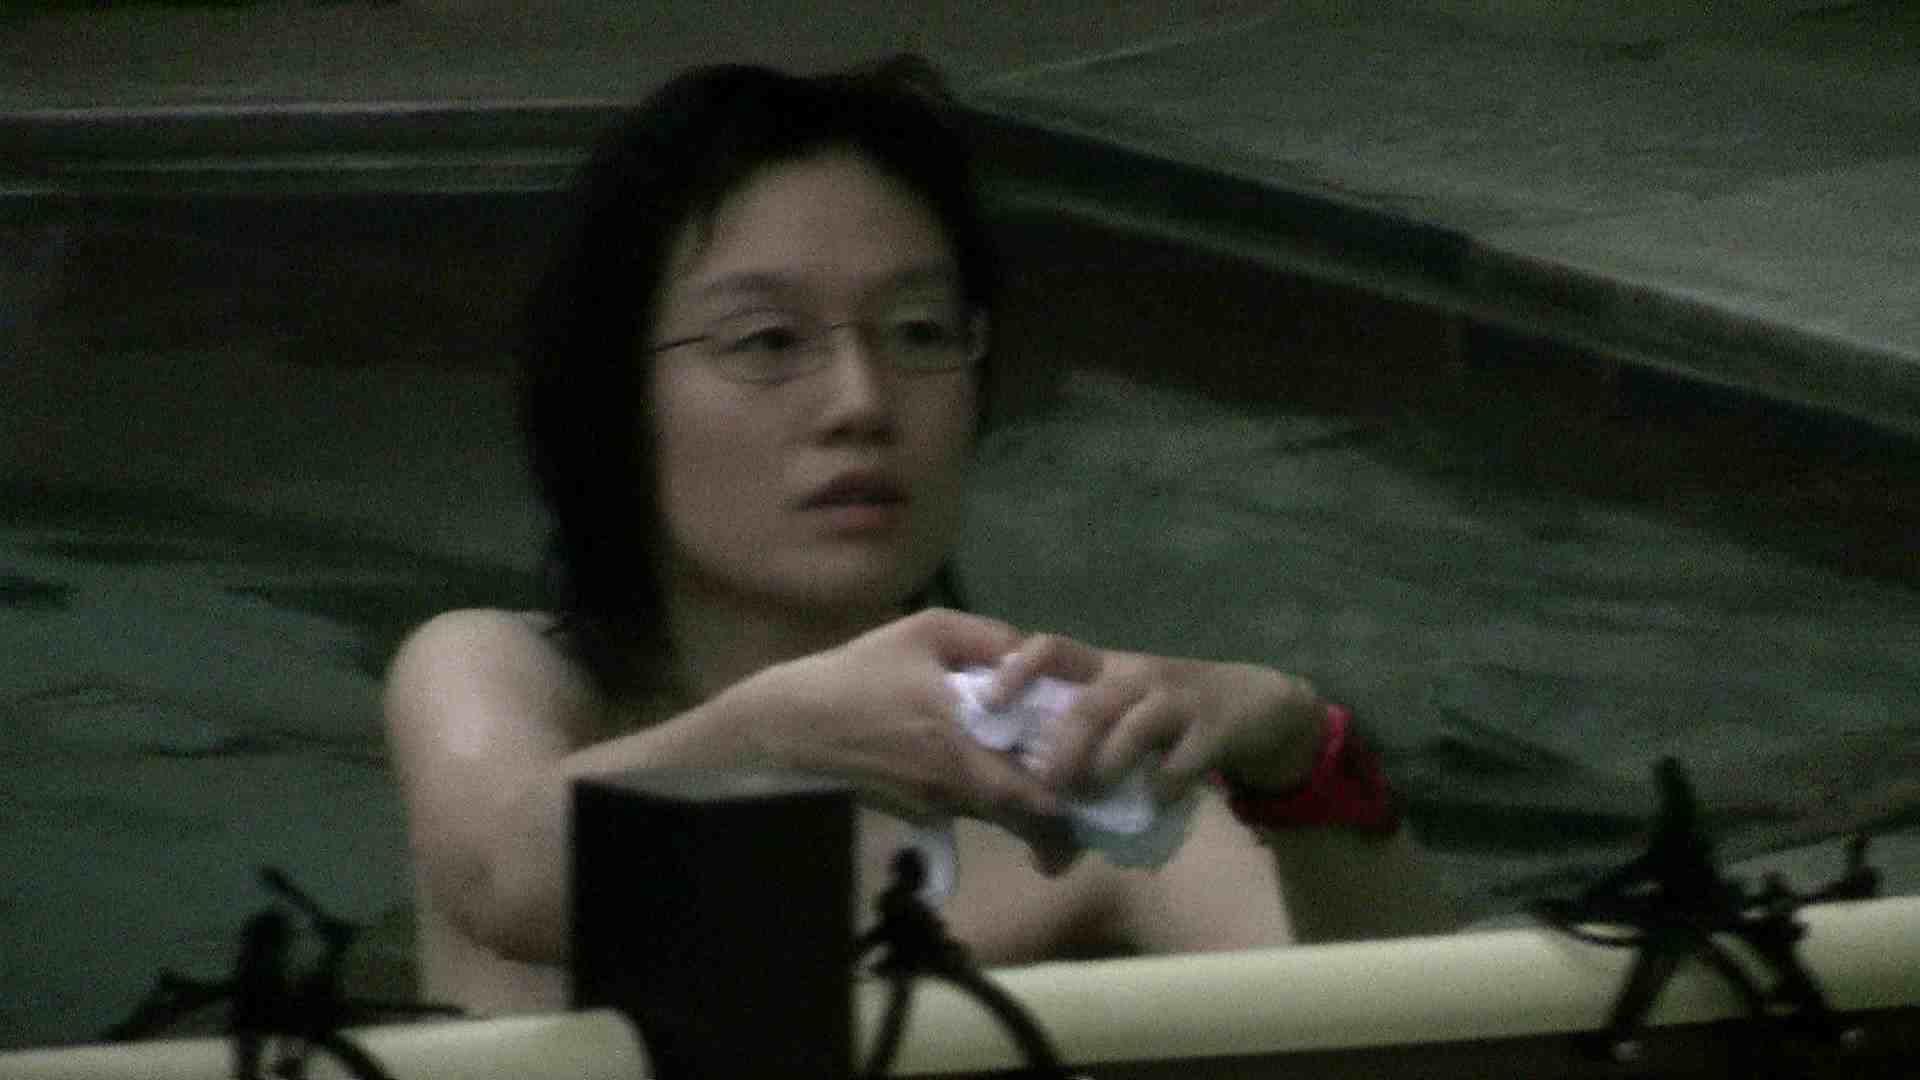 Aquaな露天風呂Vol.684 OLのエロ生活   露天風呂  59連発 1